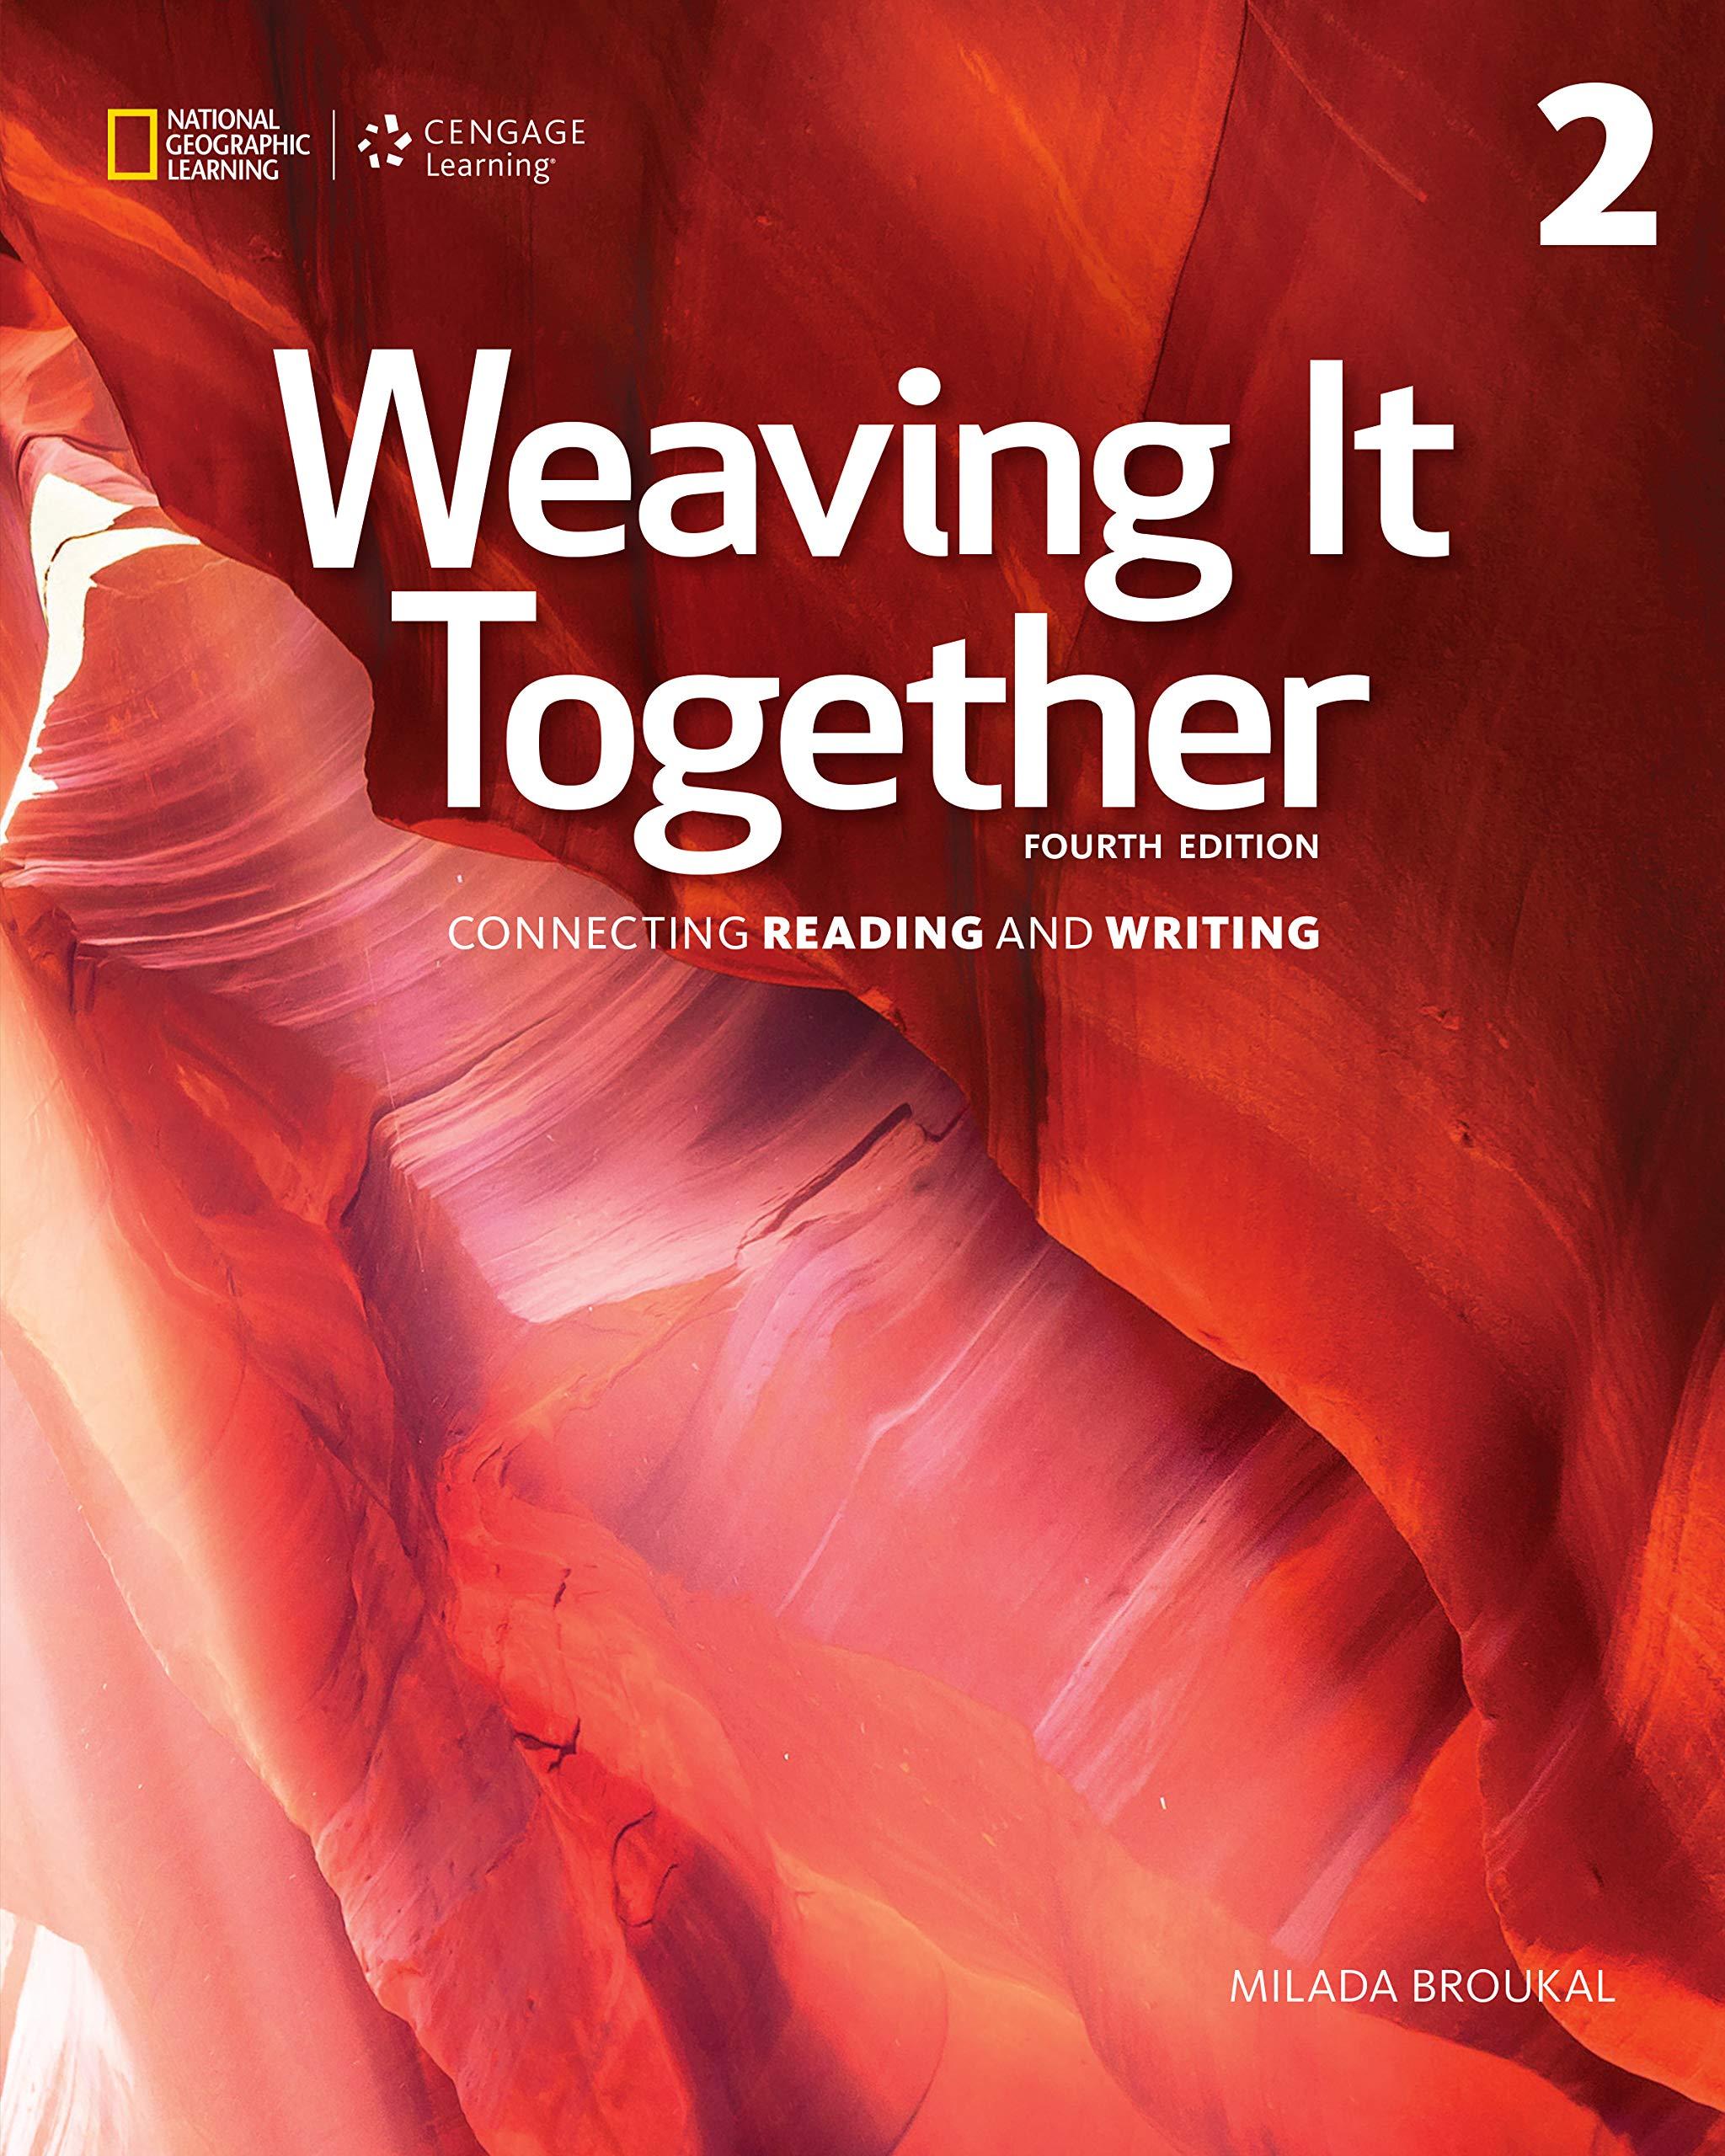 Amazon.com: Weaving It Together 2: 0 eBook : Broukal, Milada: Kindle Store